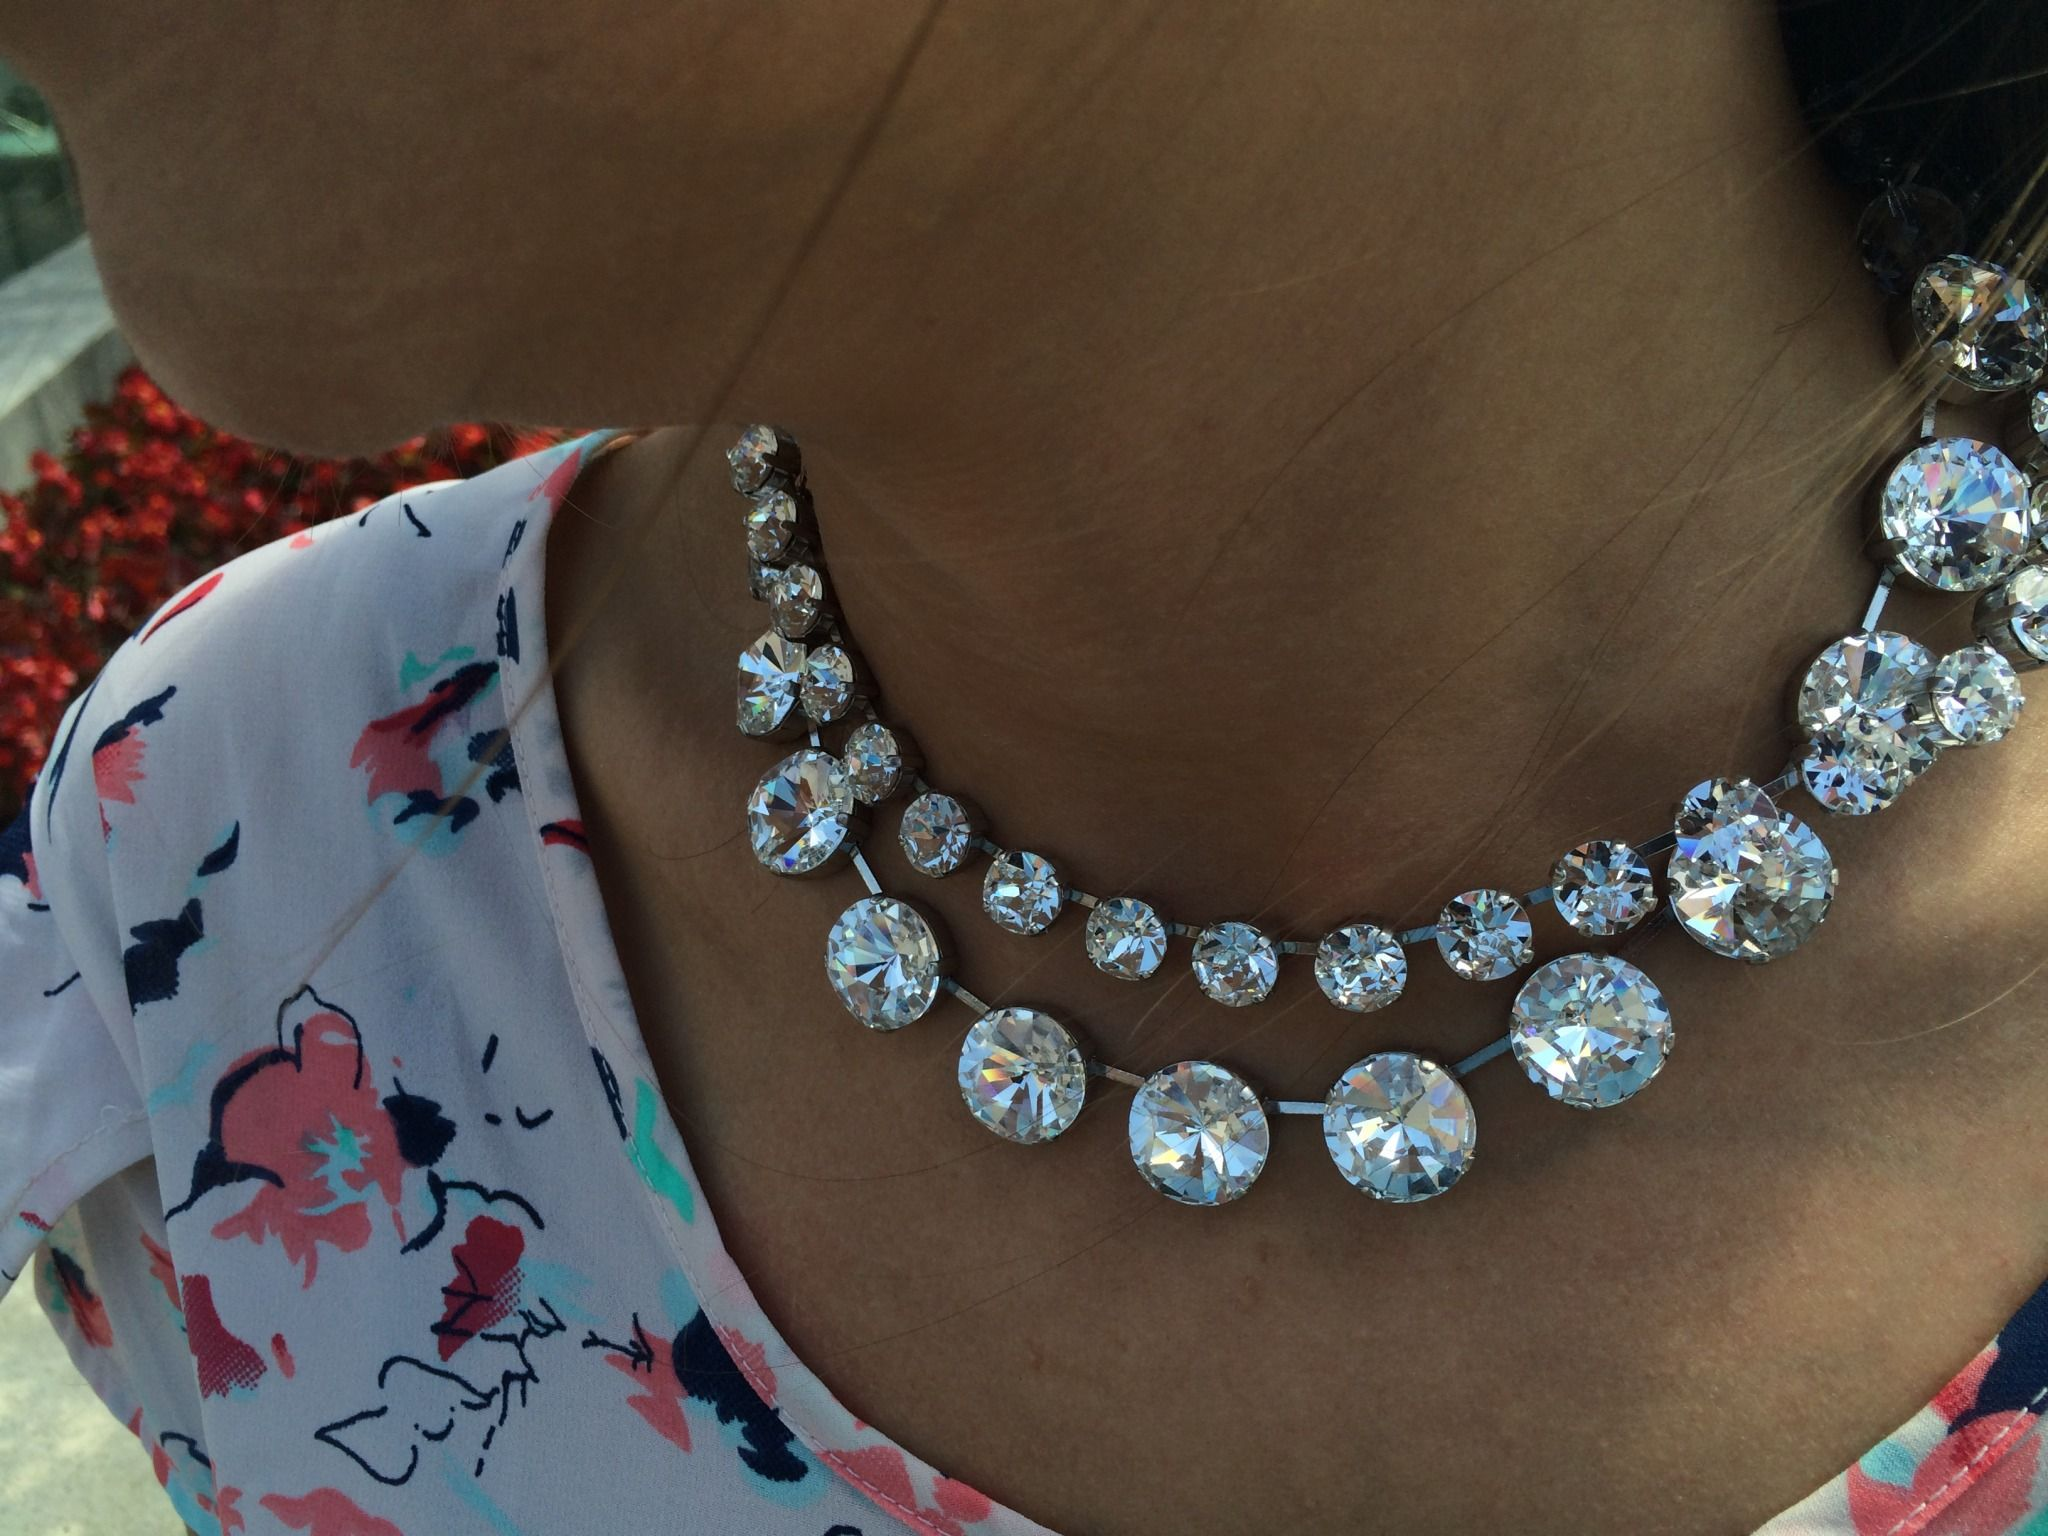 Sabika look necklace - Sabika Spotlight Vienna And London Choker